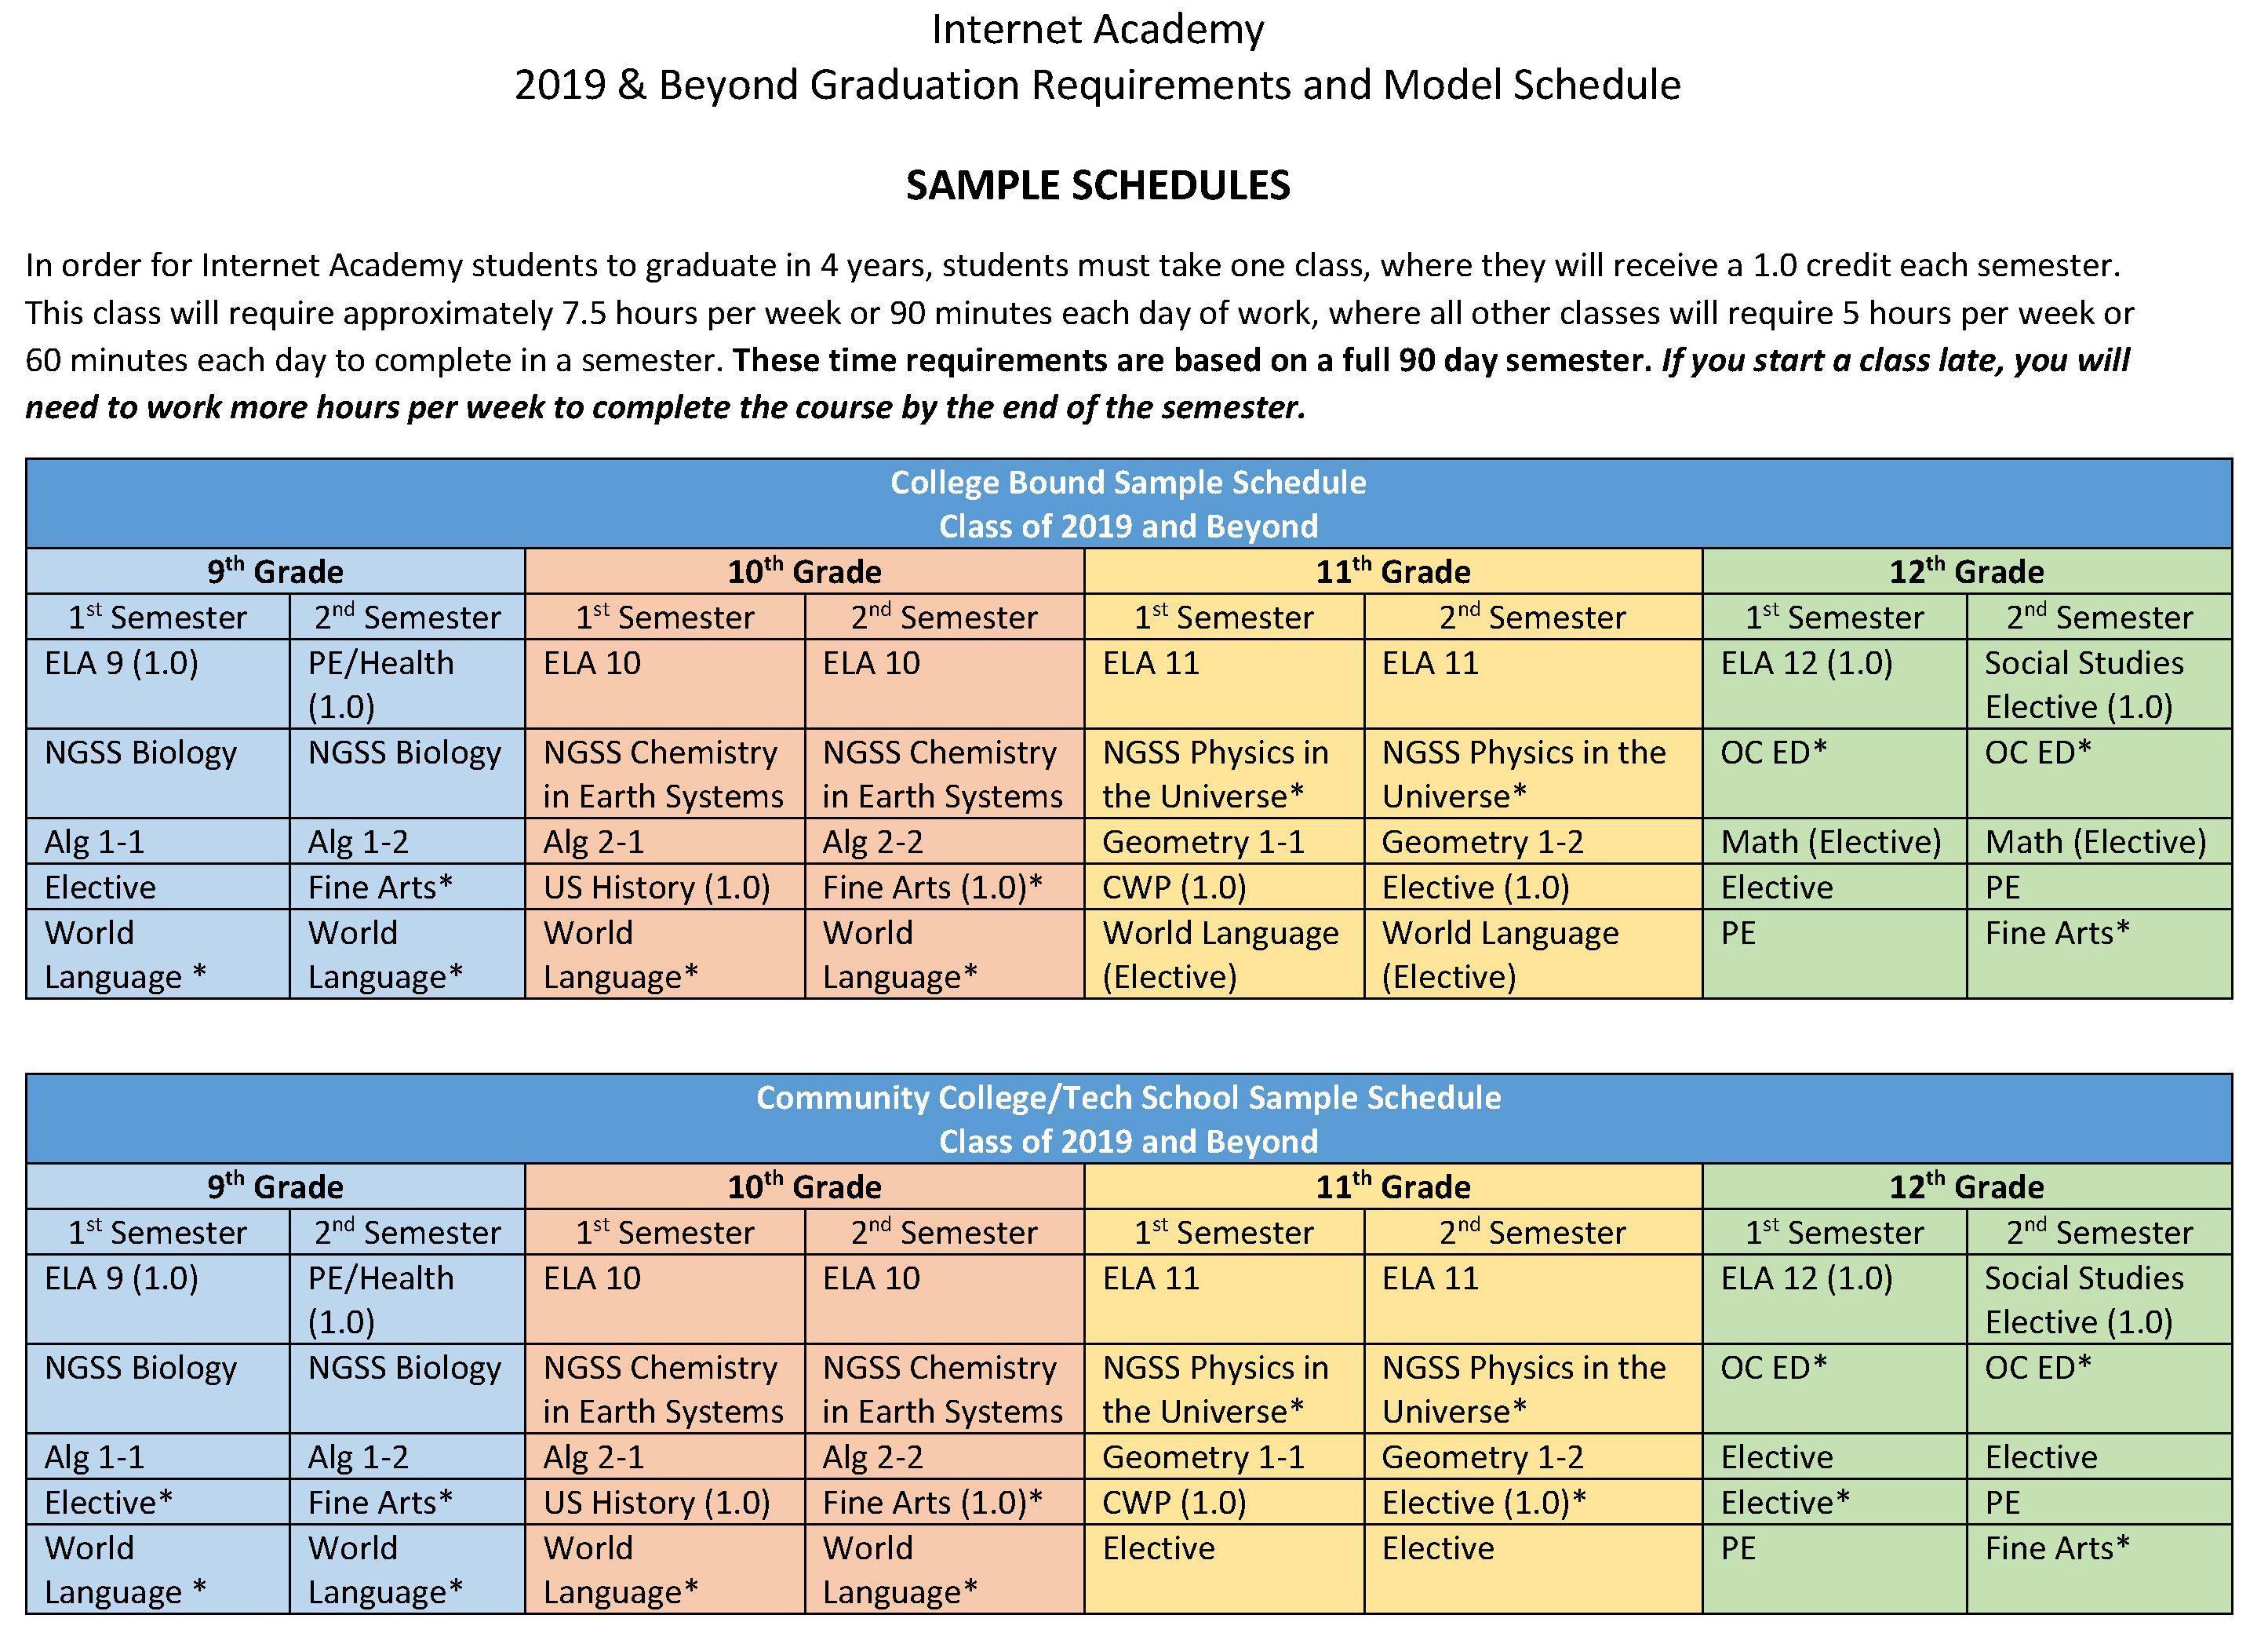 class of 2019 beyond sample schedule  u2013 internet academy  k